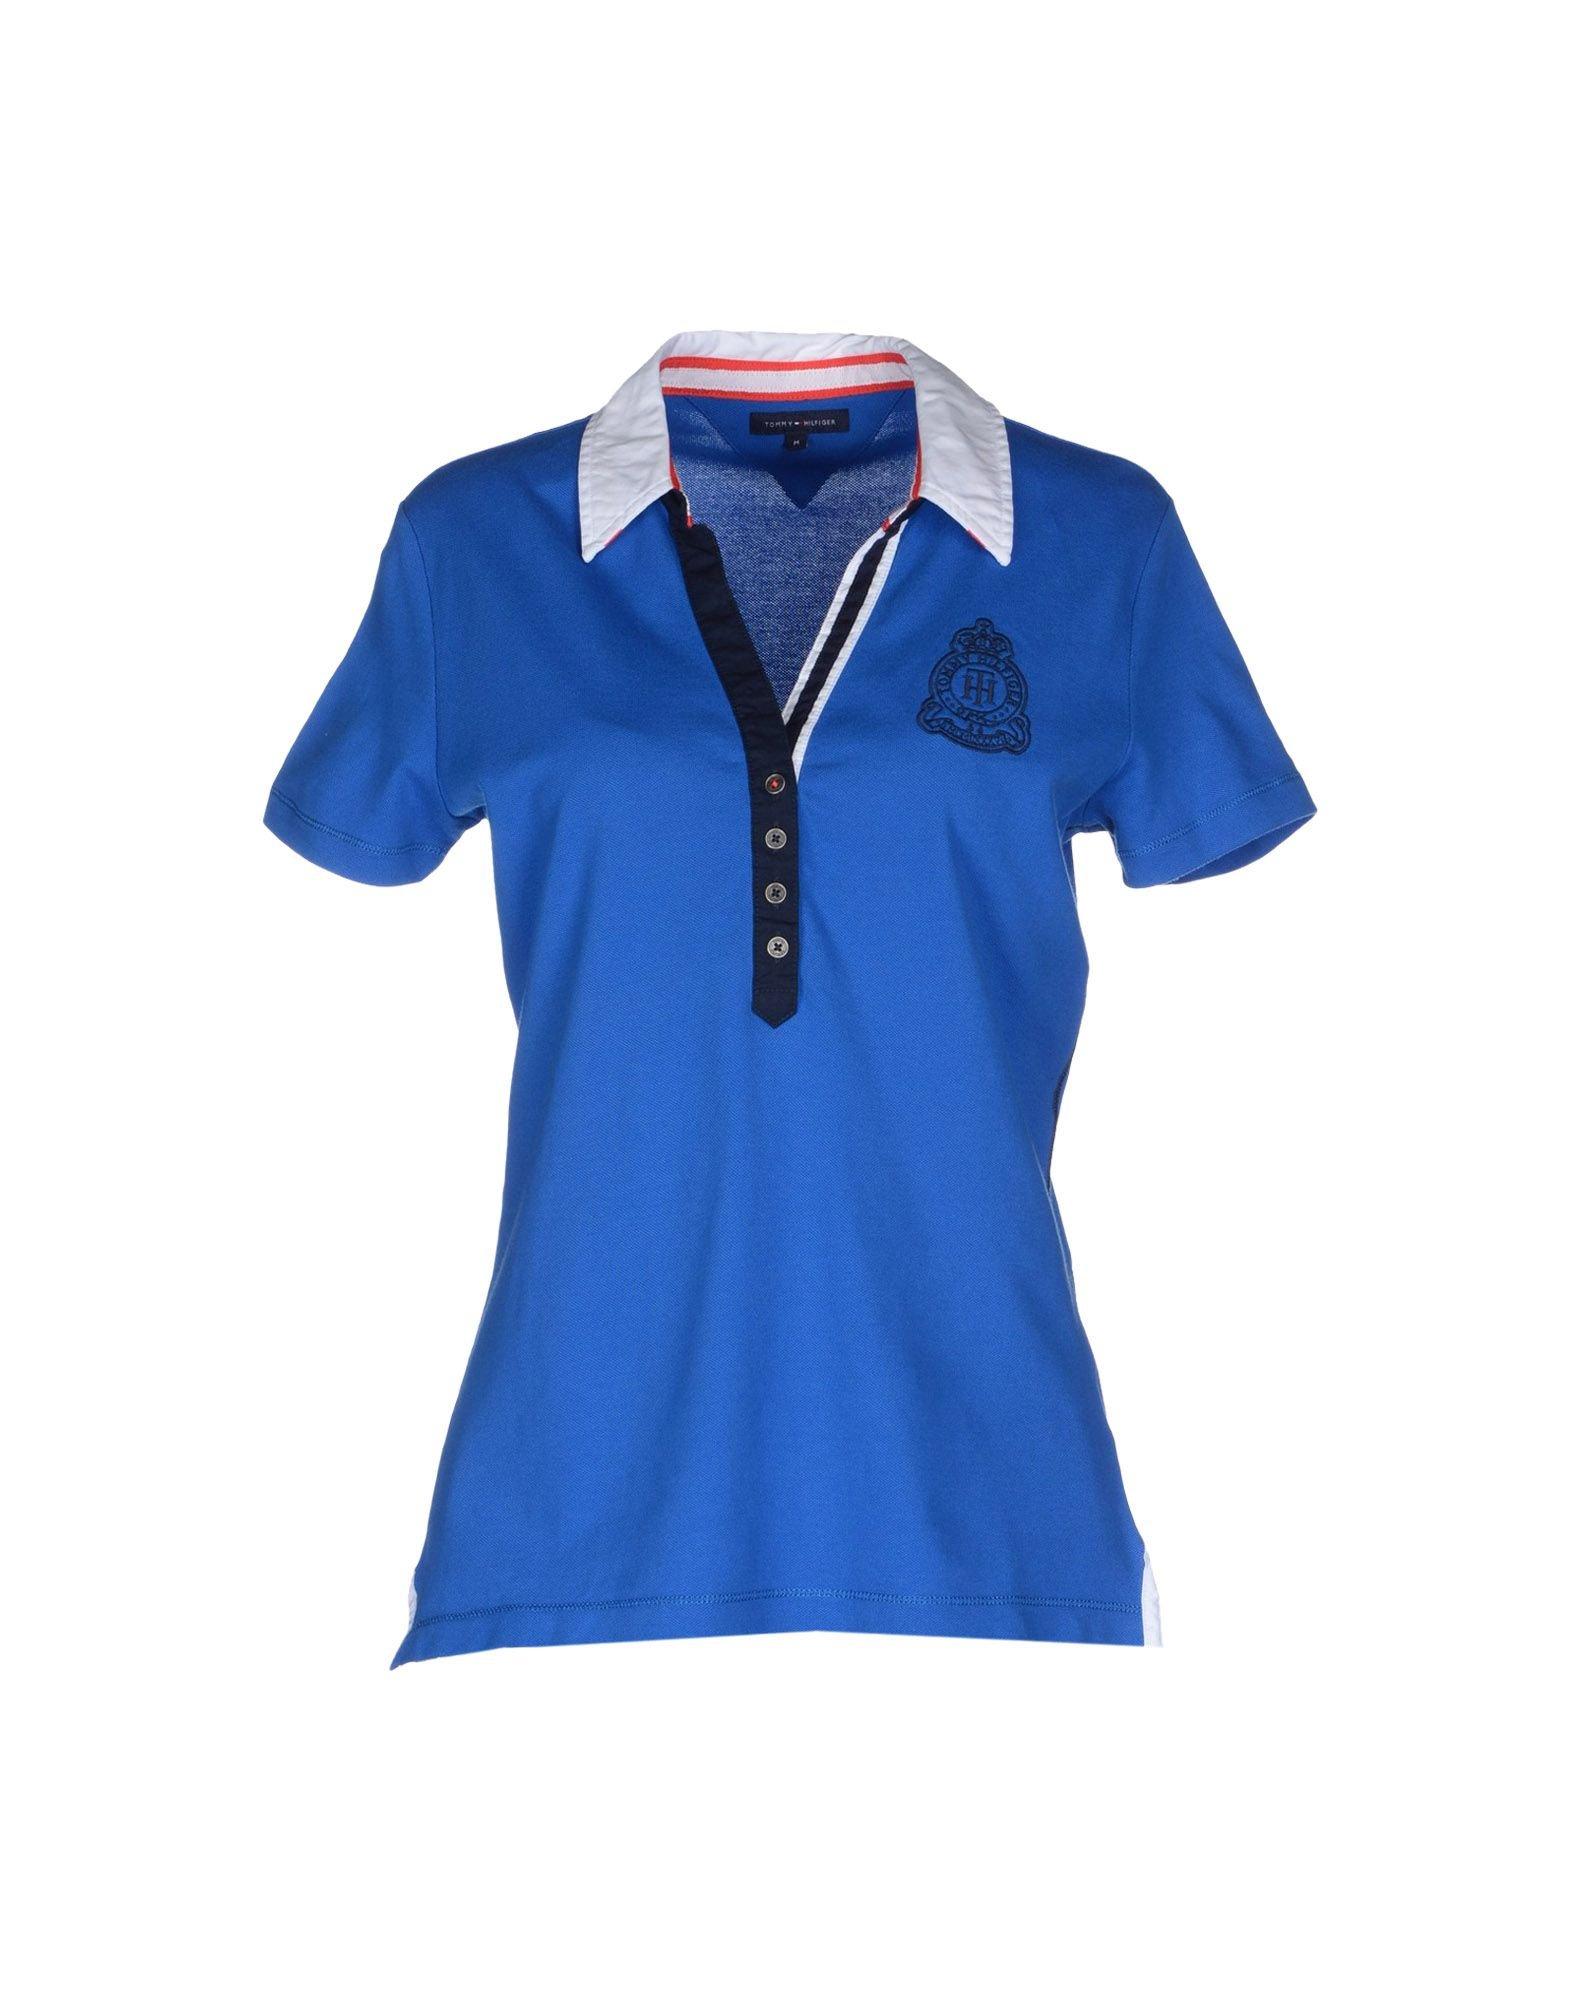 tommy hilfiger polo shirt in blue lyst. Black Bedroom Furniture Sets. Home Design Ideas